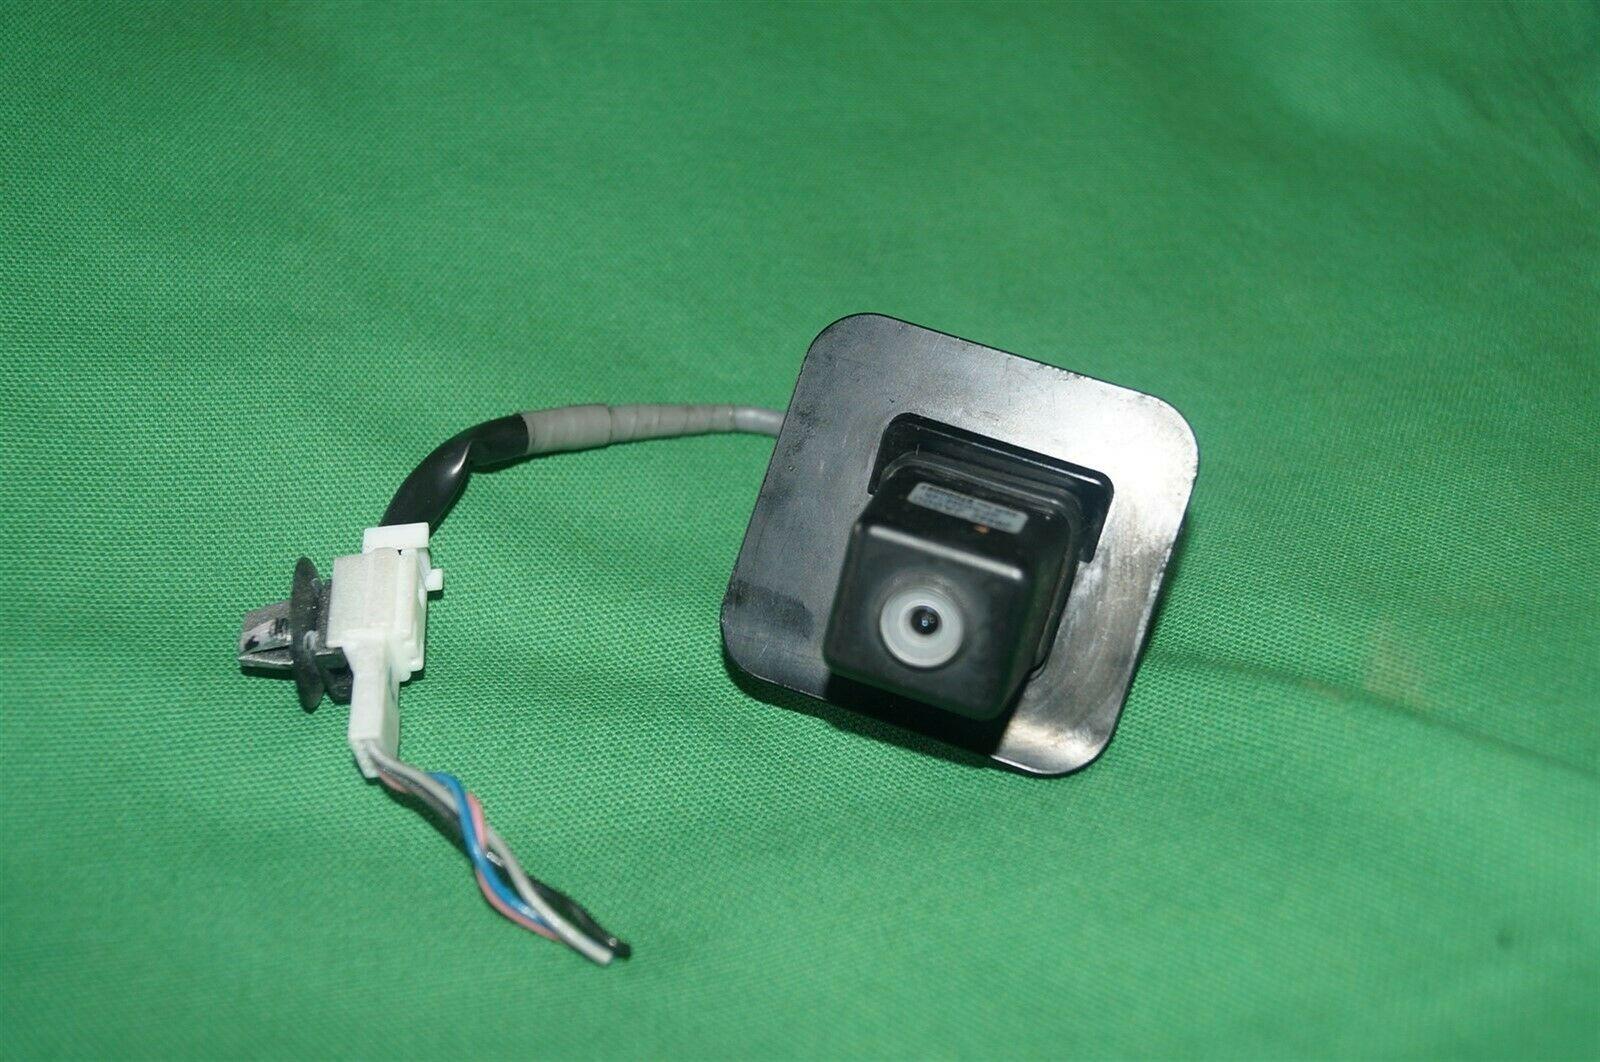 10-12 Nissan Altima Rear Trunk Backup Reverse Camera 28442-JA000